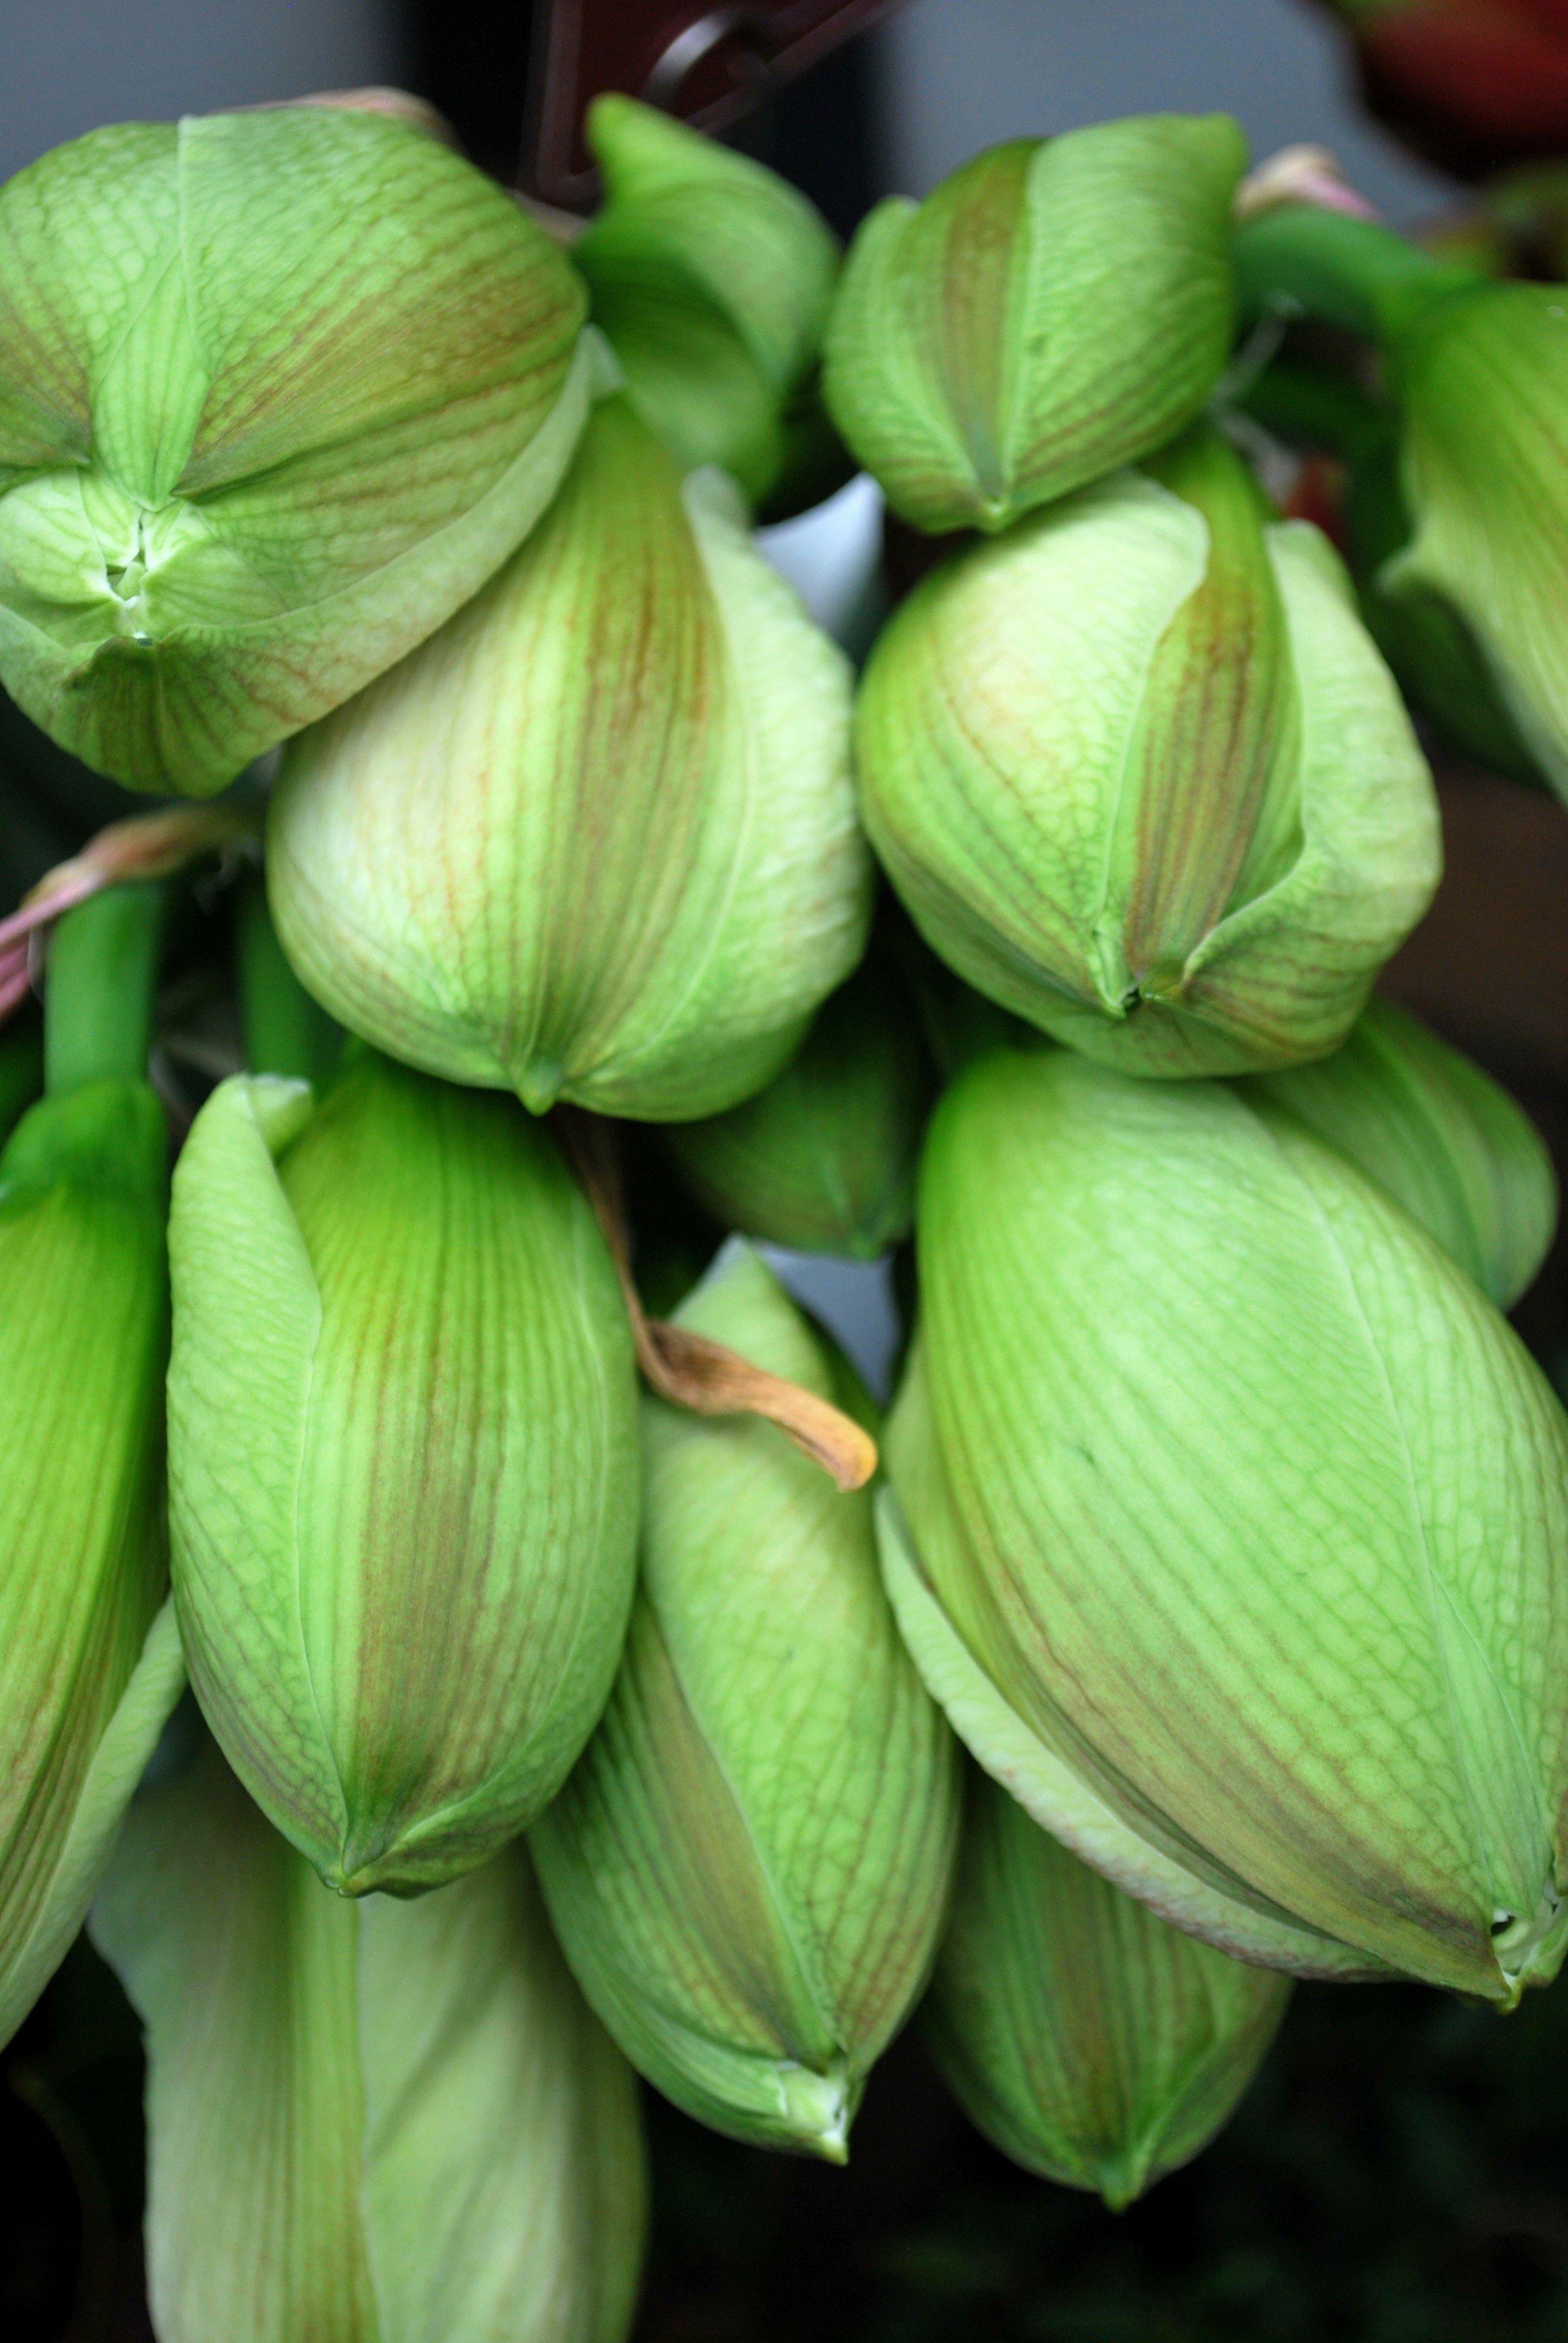 Amaryllis blooms in a farmer's market in Dusseldorf, Germany.